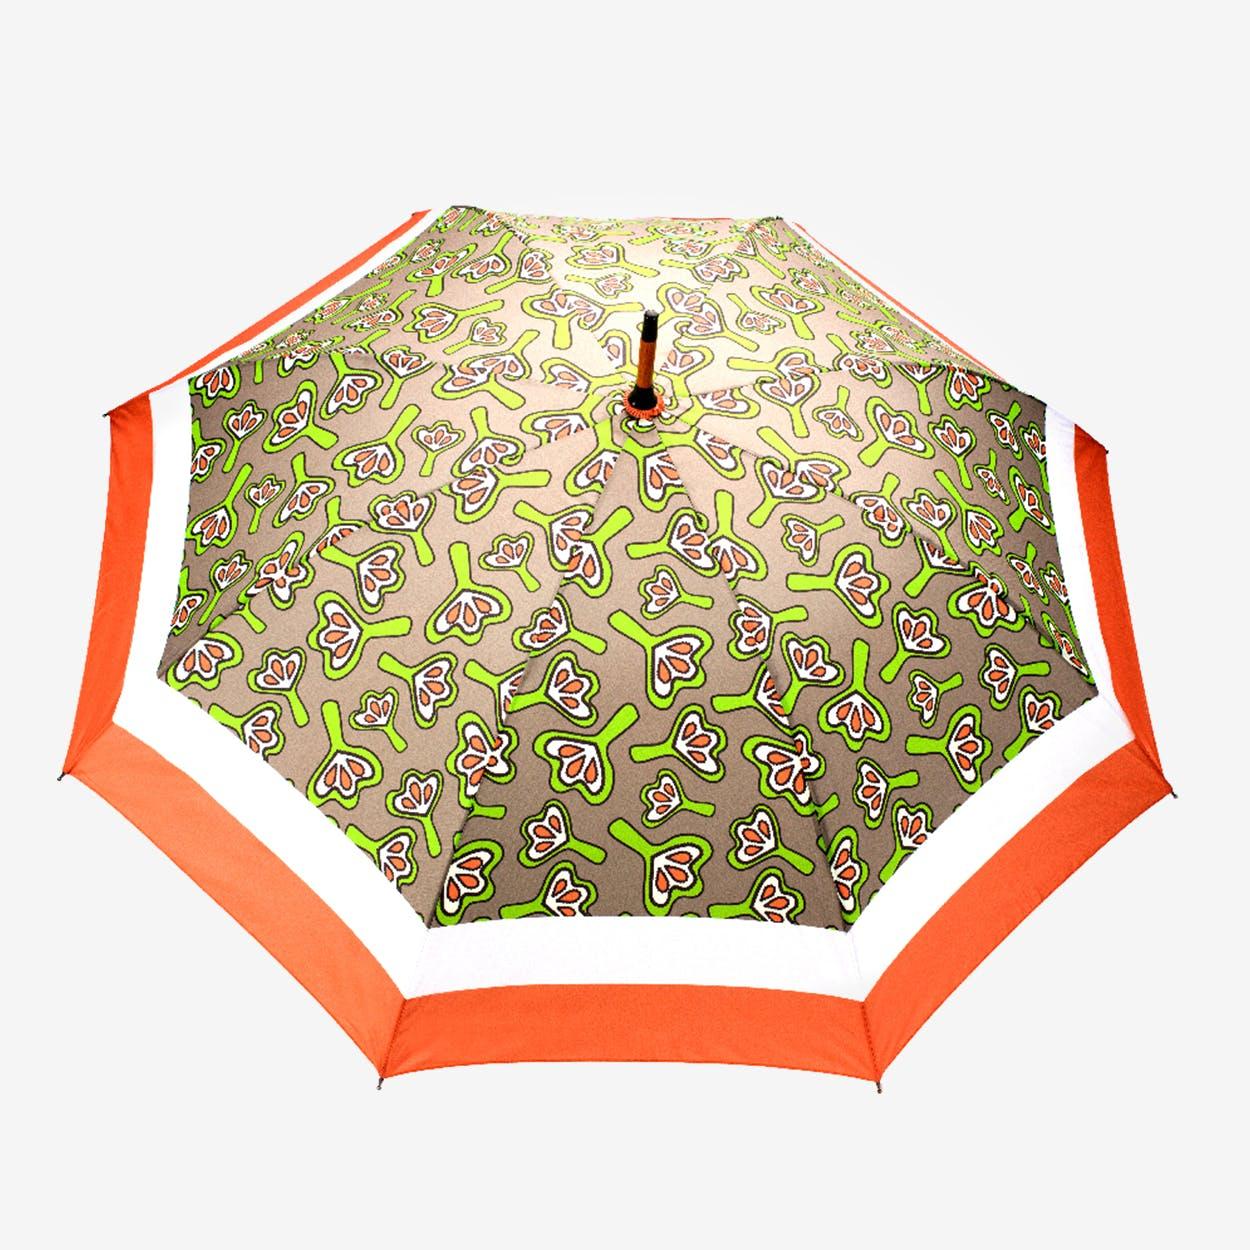 Windproof Auto Open Large Umbrella in Tan Lilies Design